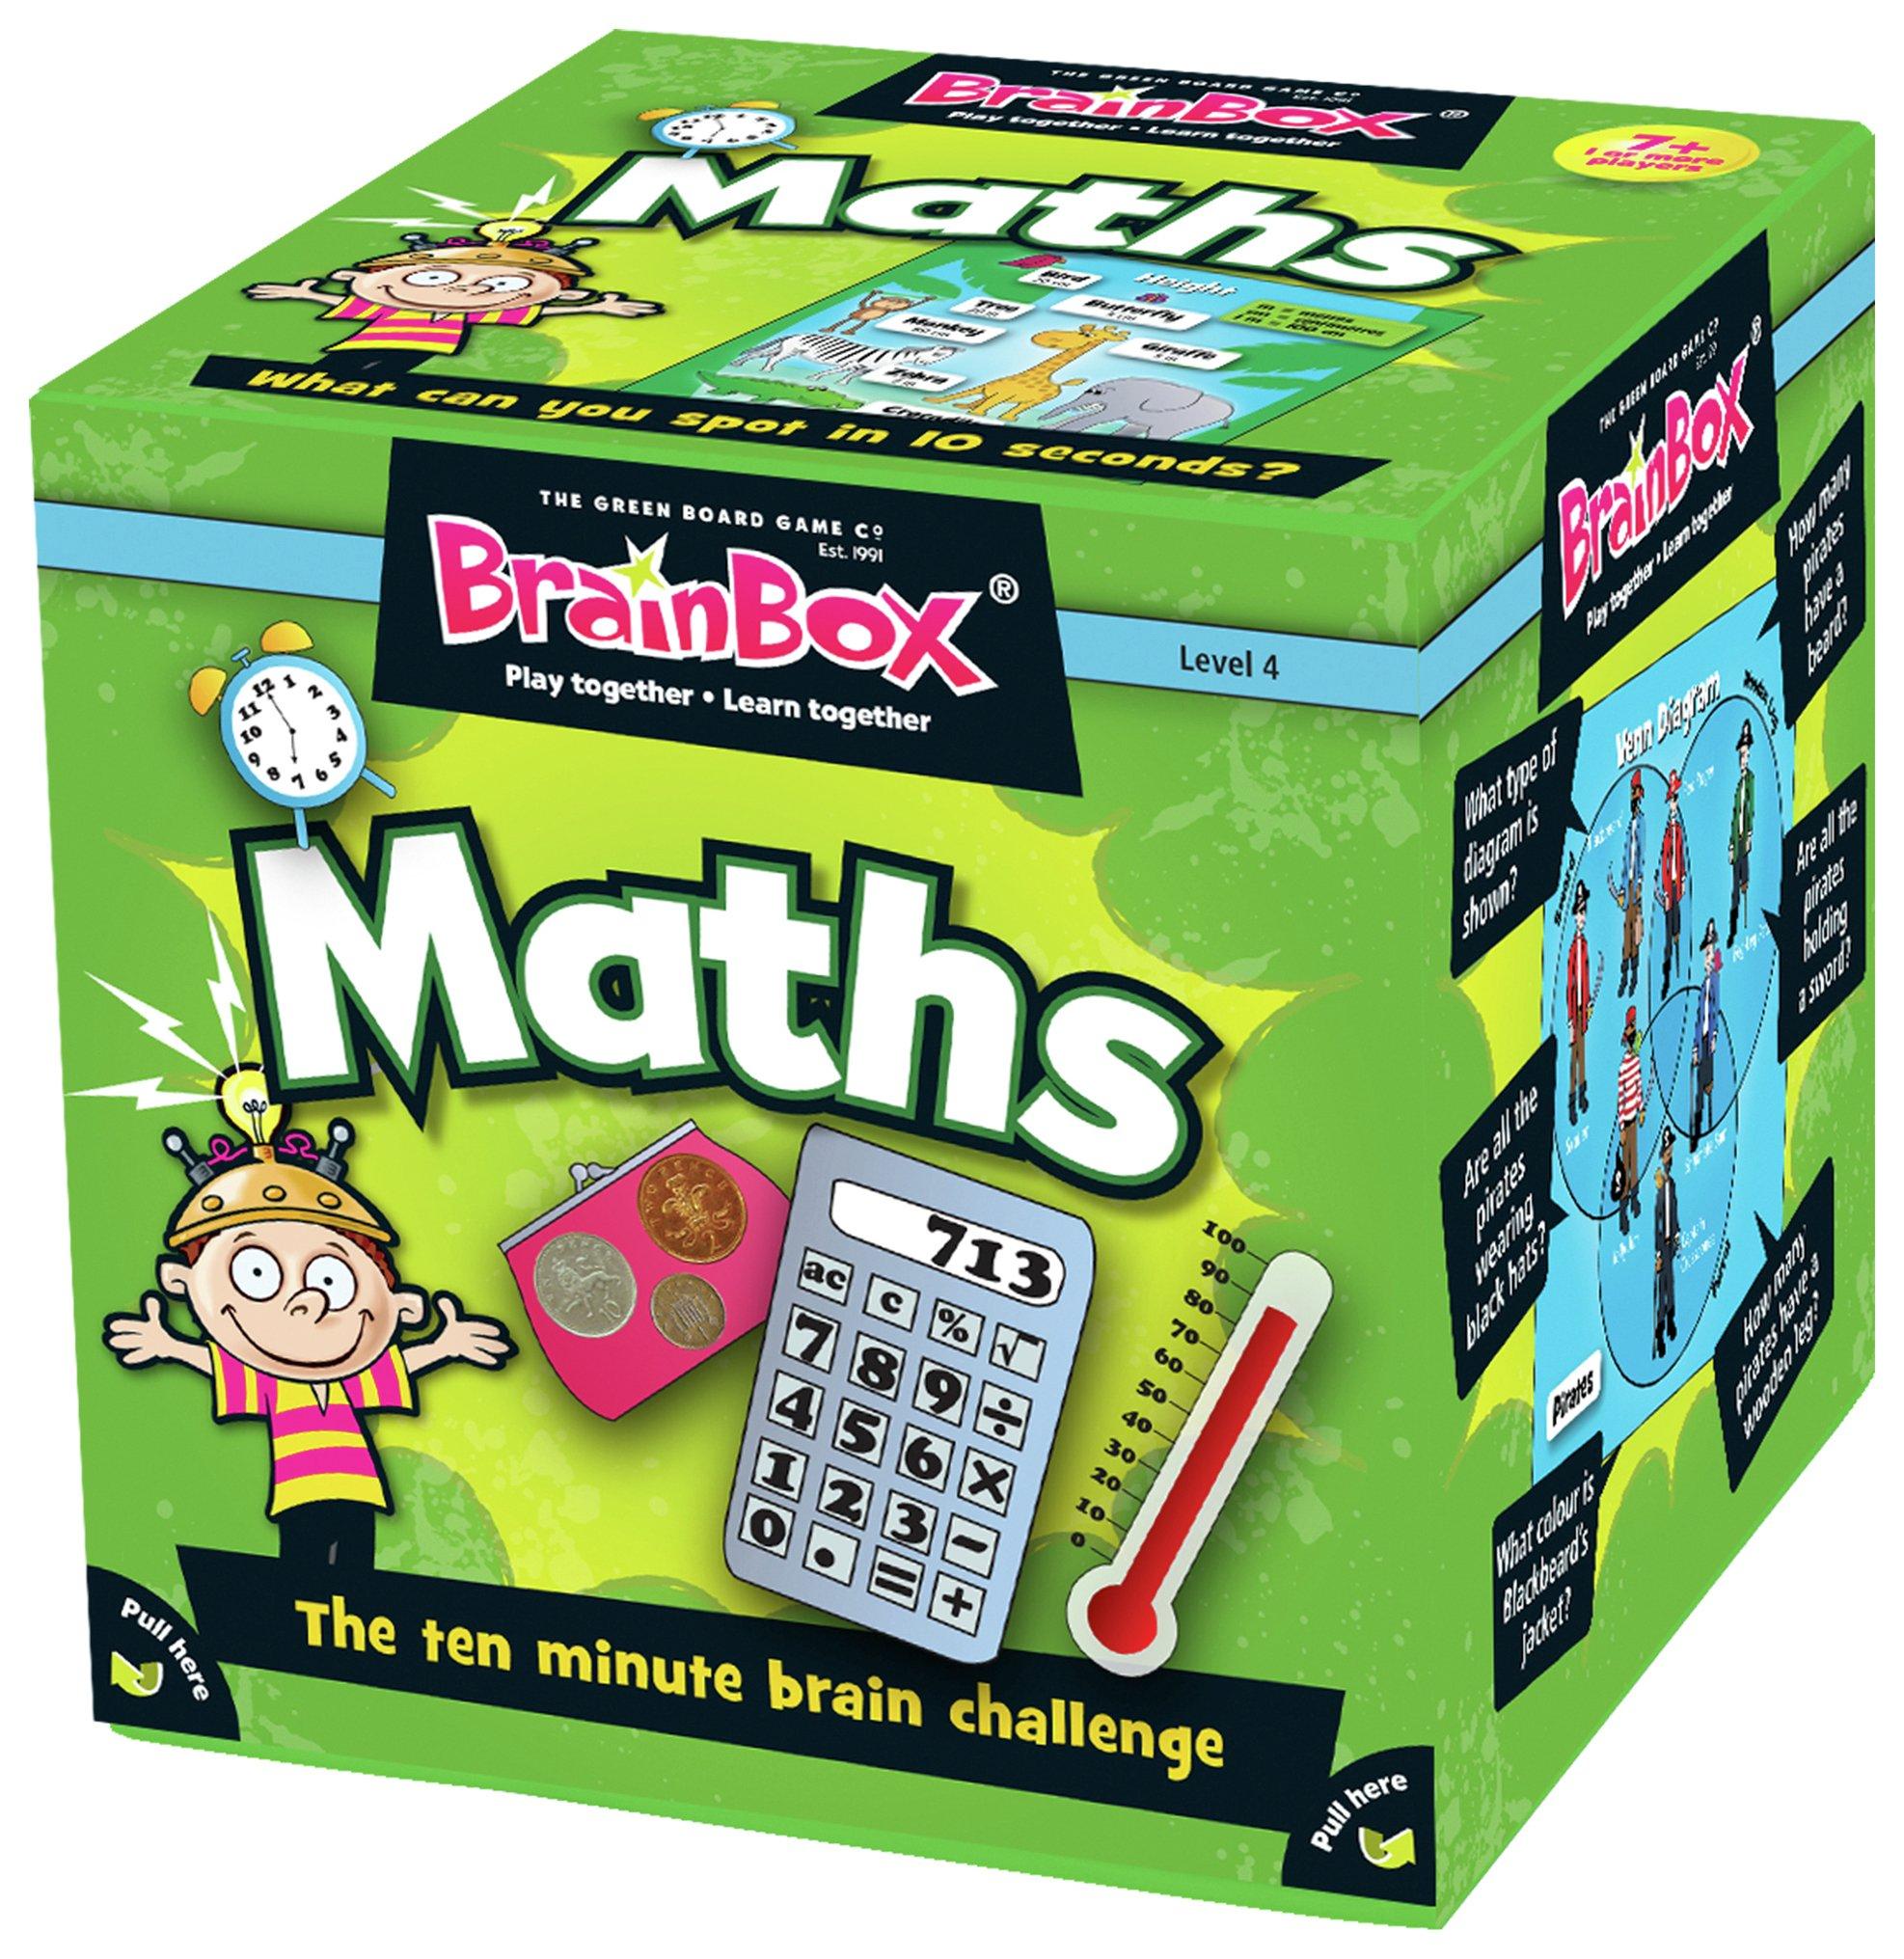 Image of Green Board Games BrainBox Maths